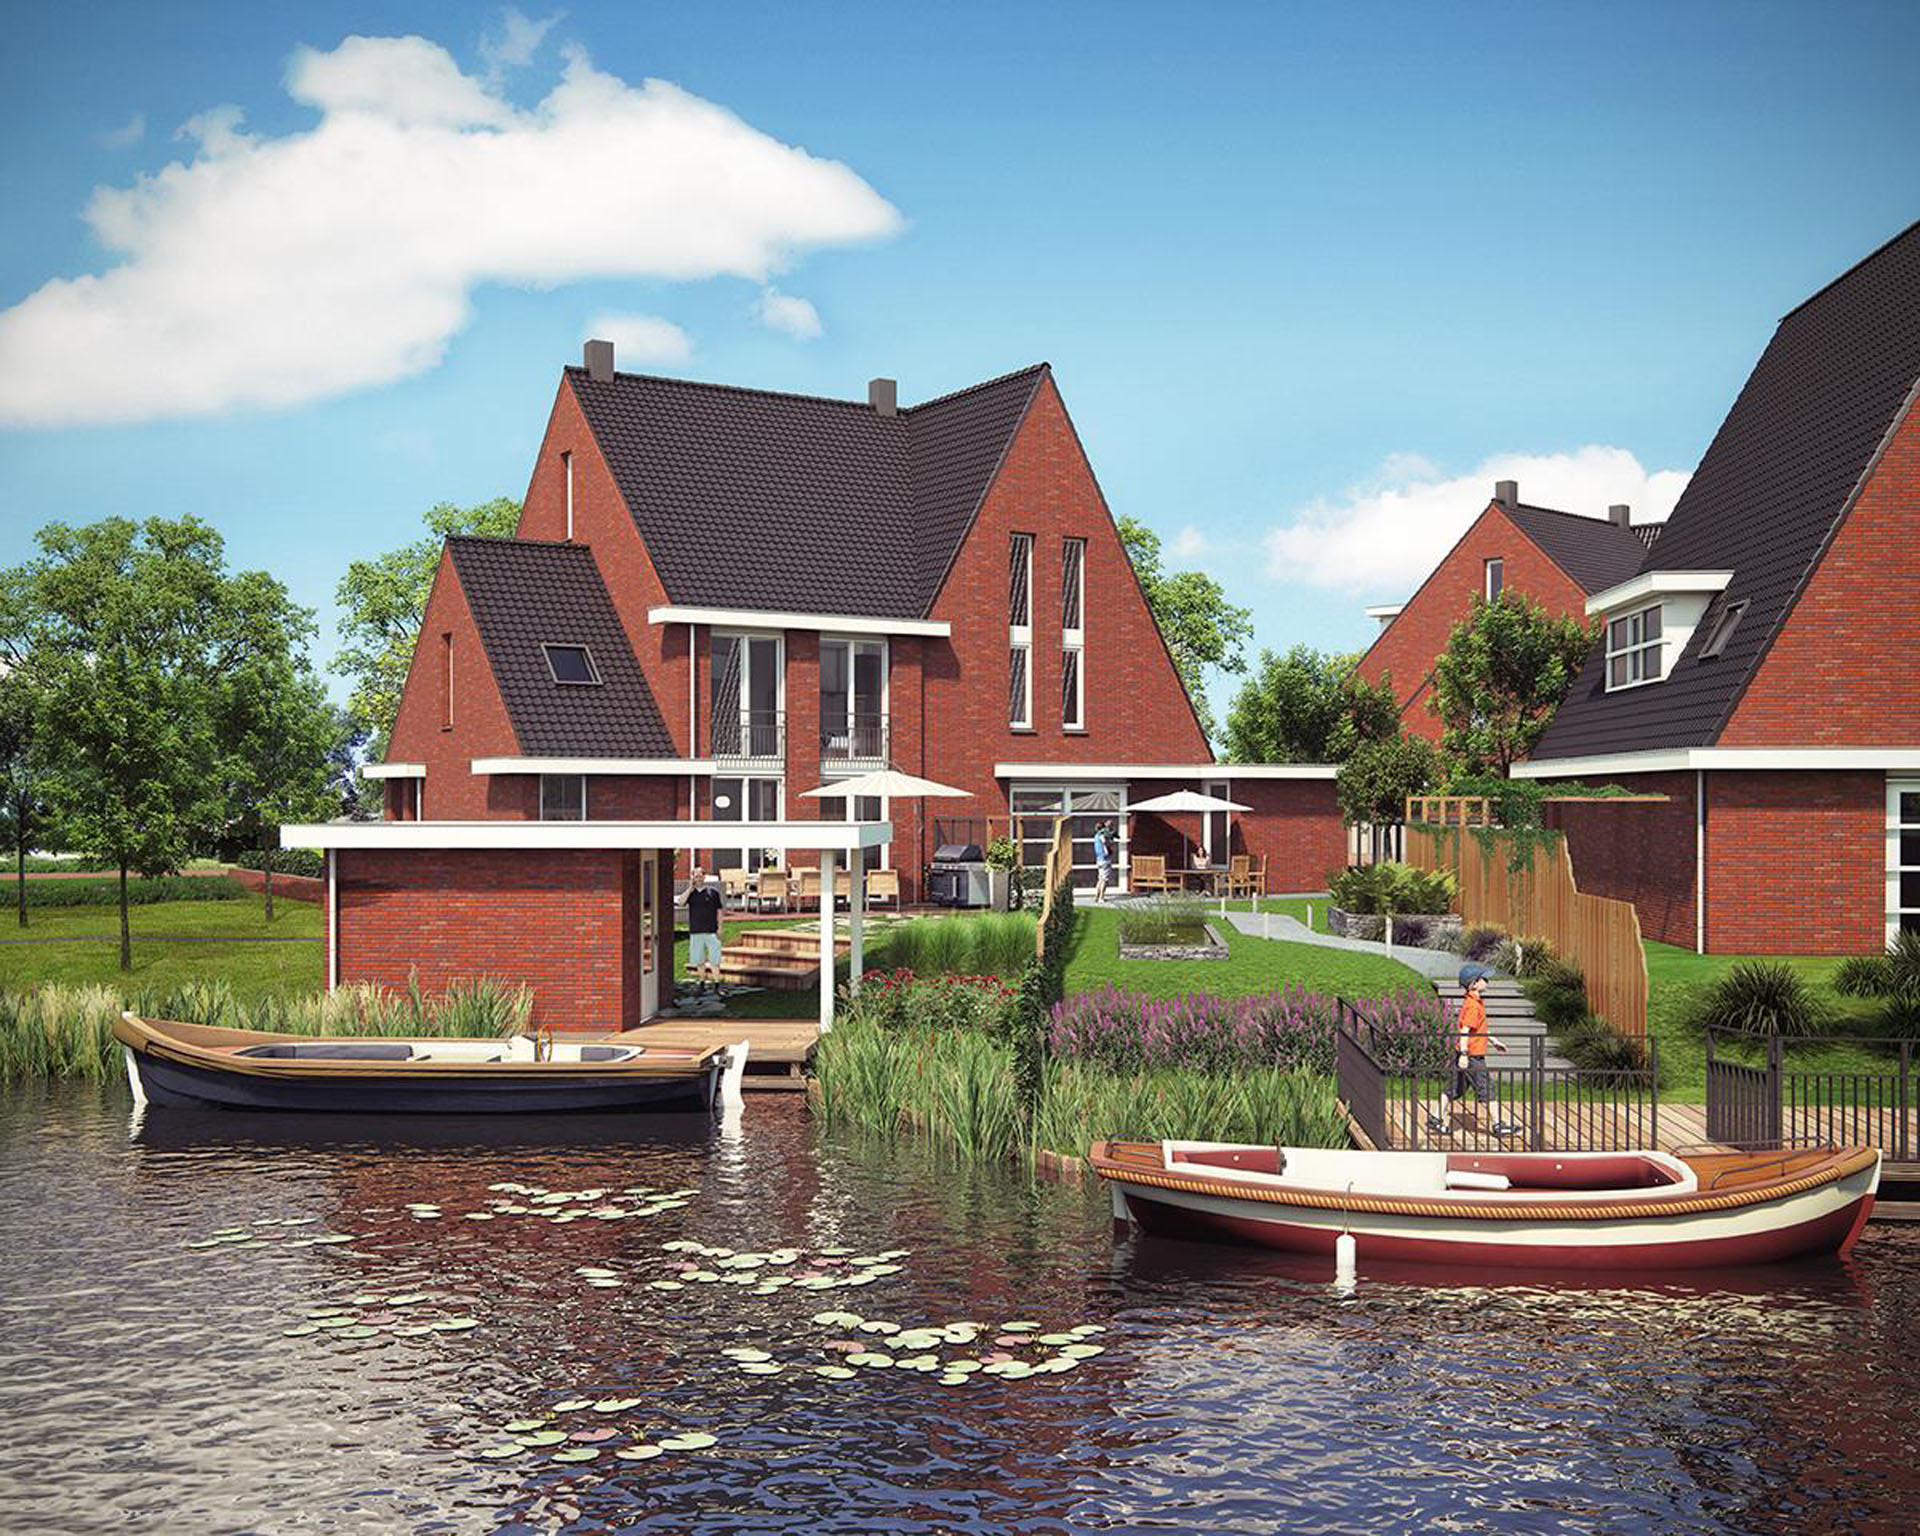 Project Watermuziek in Heemstede